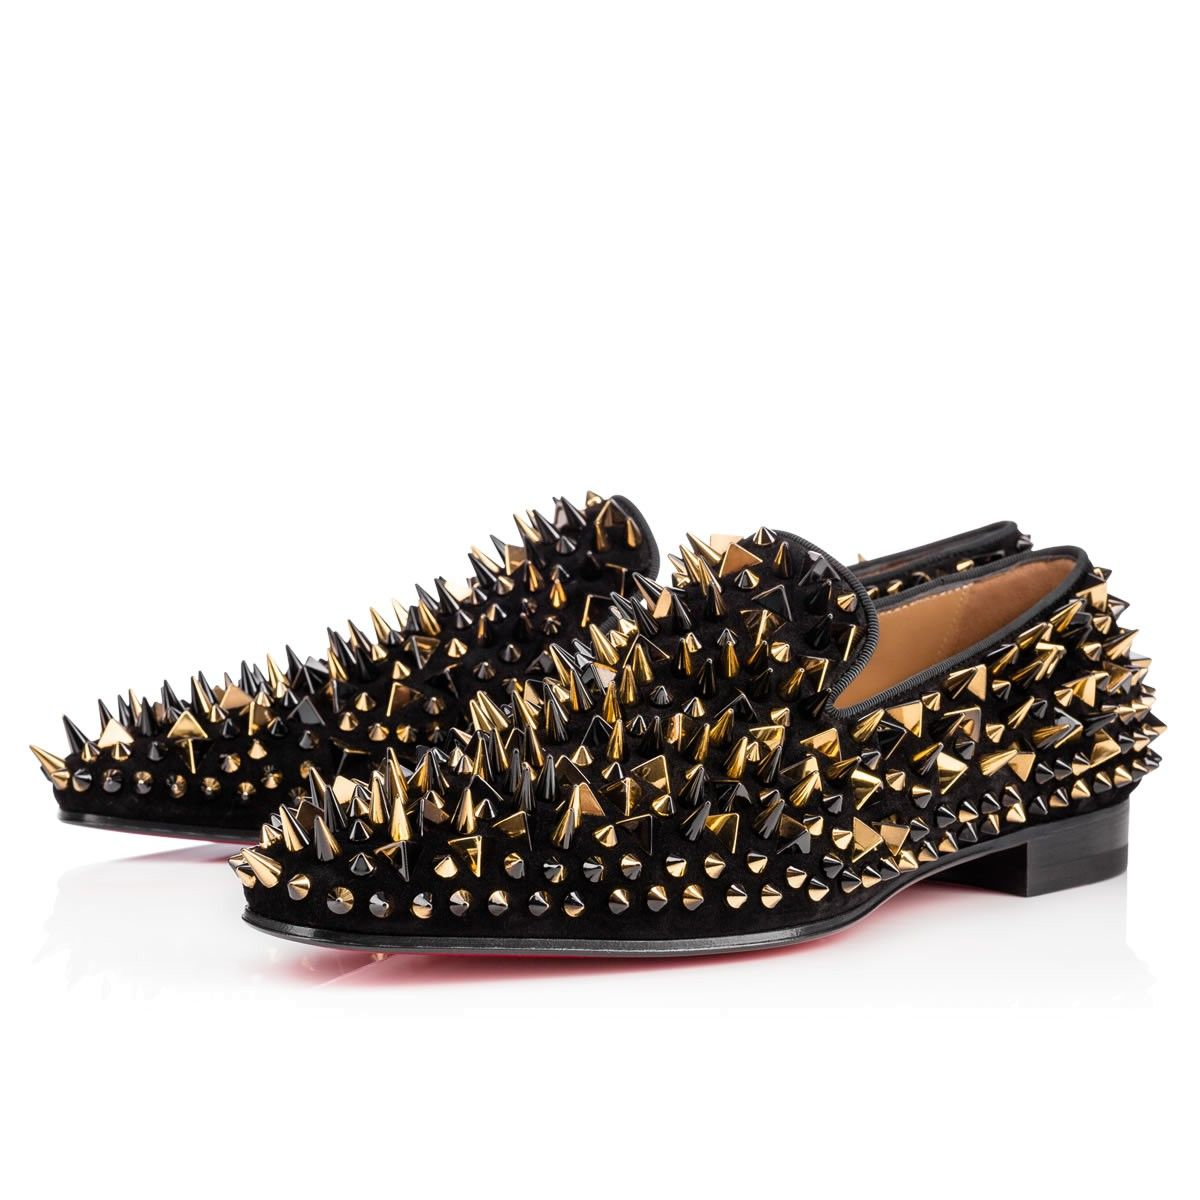 ec8354f2c8ec Shoes - Dandy Pik Pik - Christian Louboutin